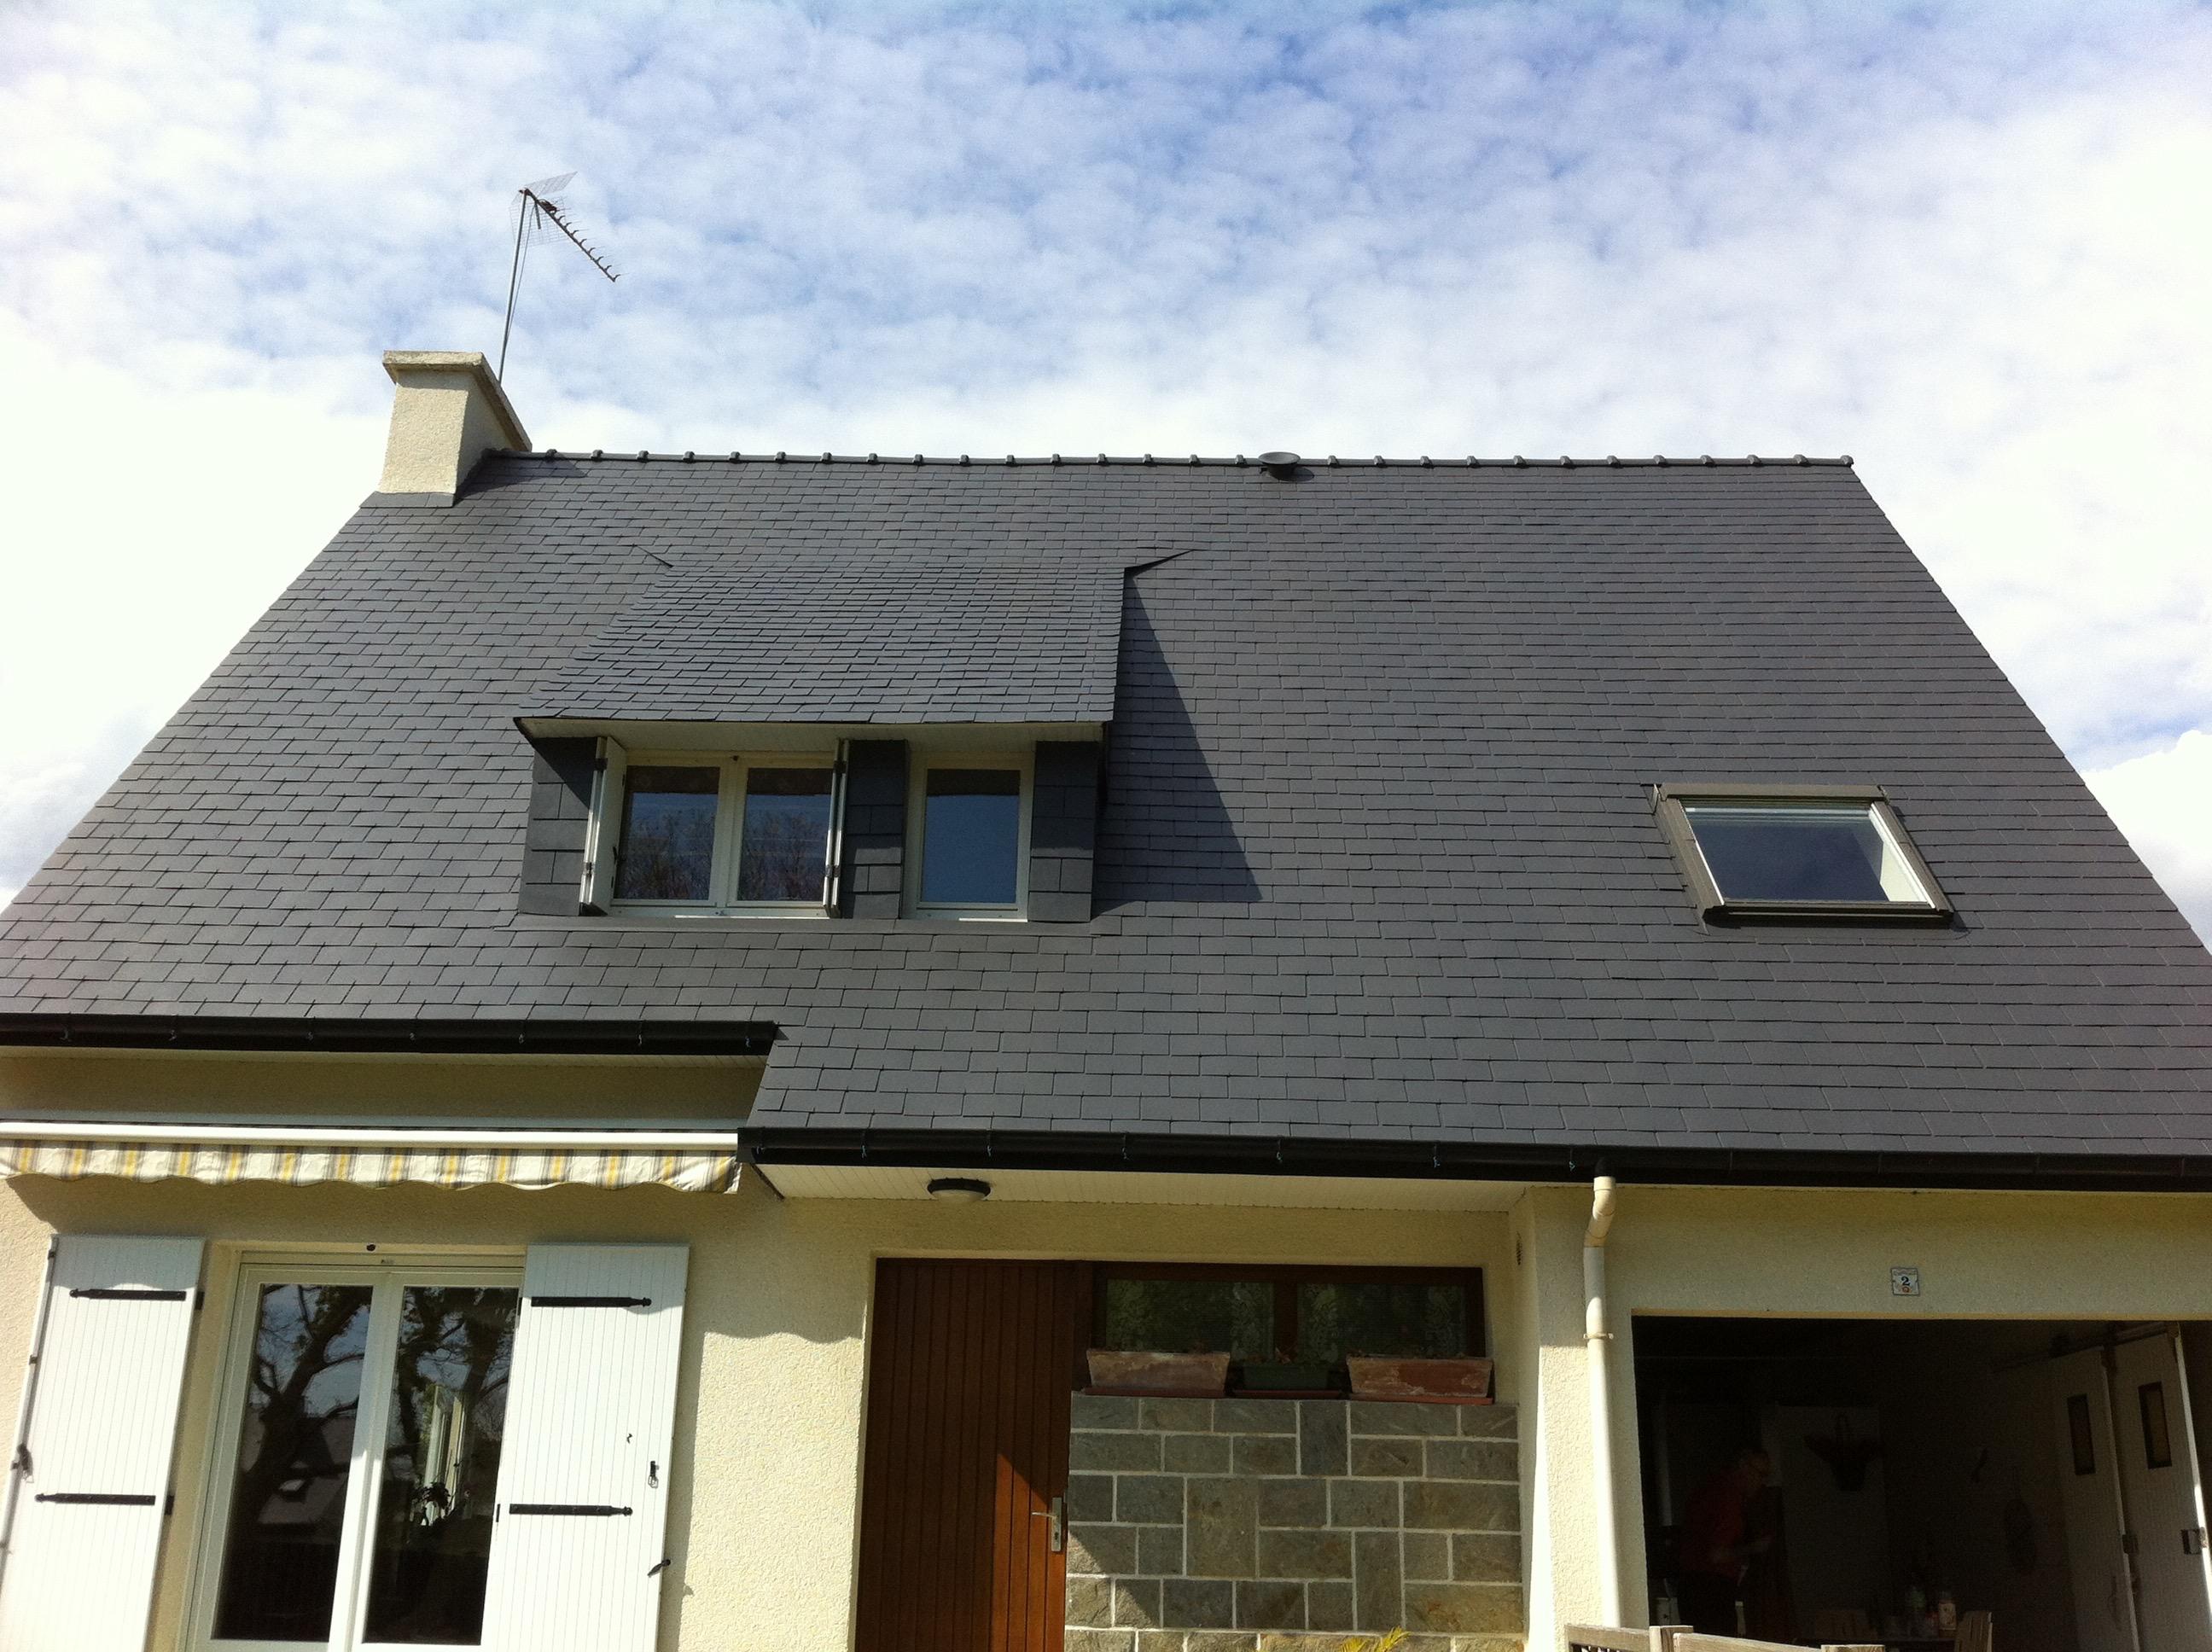 entreprise de toiture lobry couvreur etampes 91150. Black Bedroom Furniture Sets. Home Design Ideas